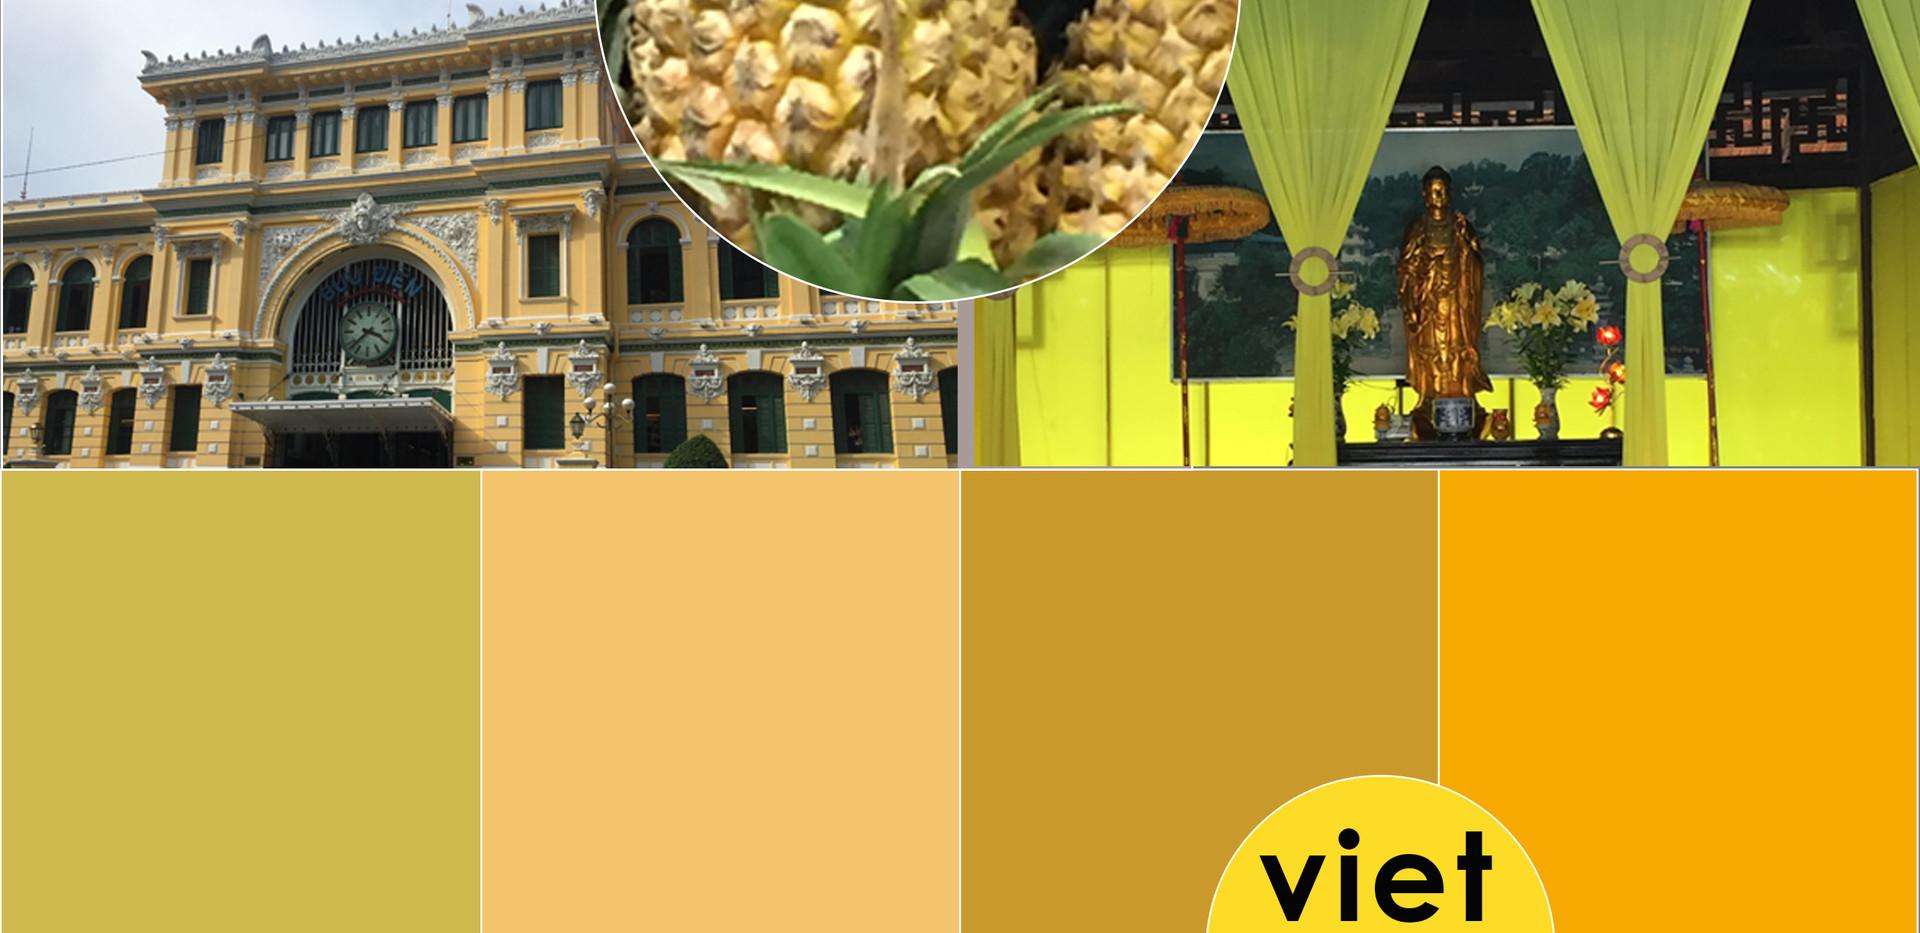 veitnam yellow 2.jpg